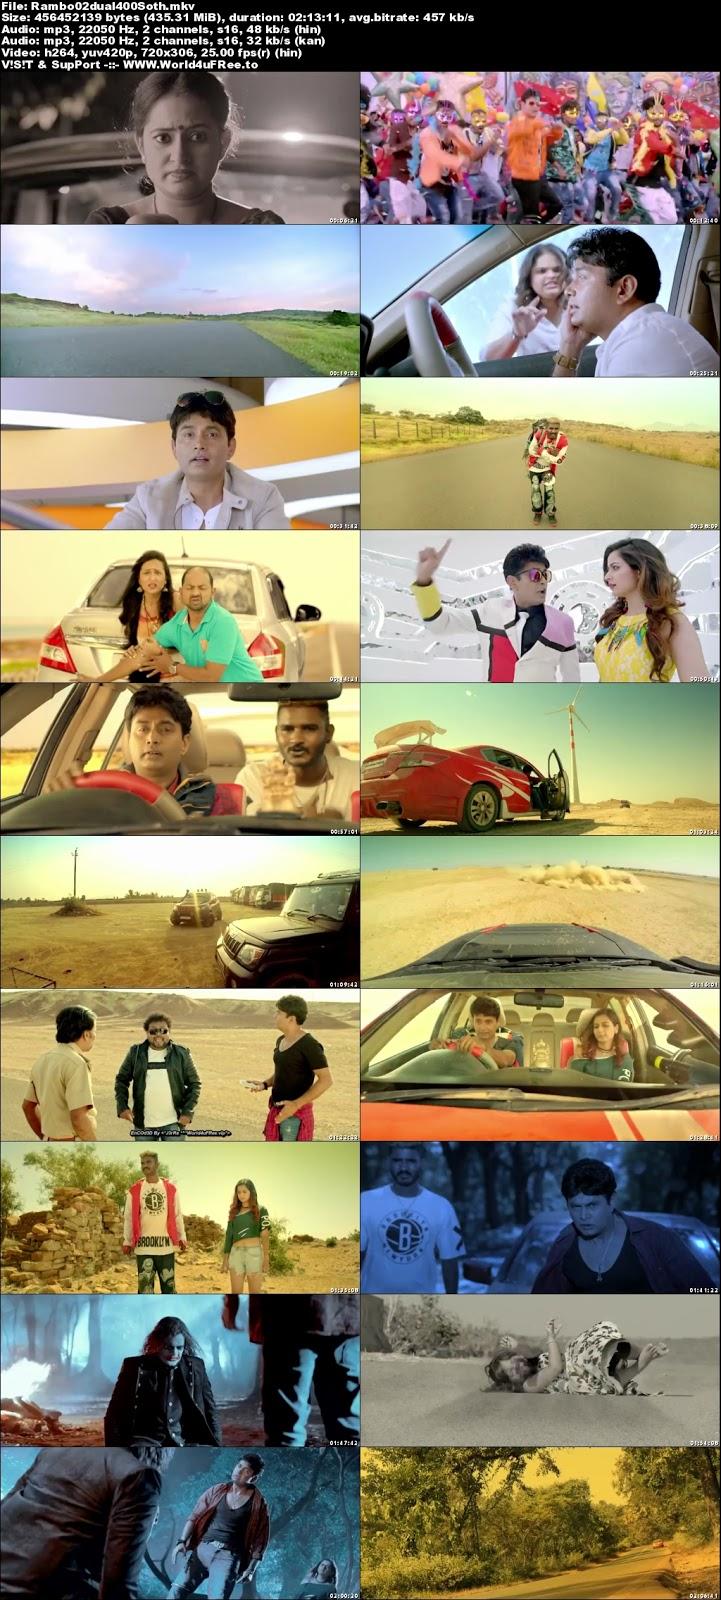 Raambo 2 2018 Dual Audio UNCUT HDRip 480p 400Mb x264 world4ufree.fun , South indian movie Raambo 2 2018 hindi dubbed world4ufree.fun 720p hdrip webrip dvdrip 700mb brrip bluray free download or watch online at world4ufree.fun